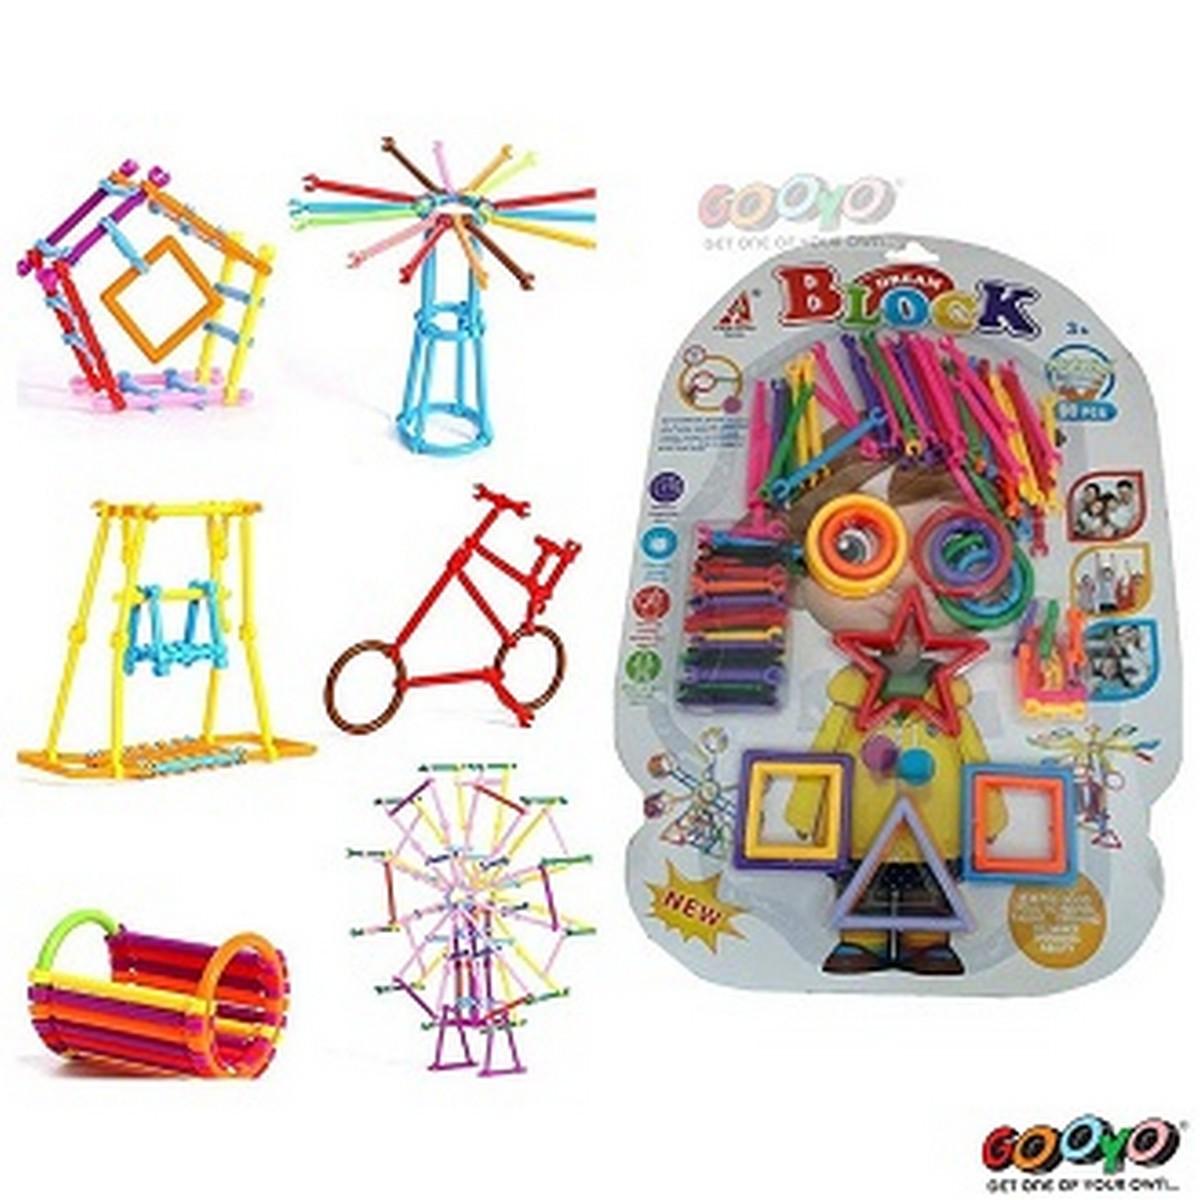 Dream Colorful Activity Sticks Building Blocks Toys for Boys Girl Kids Children- 98 pcs.